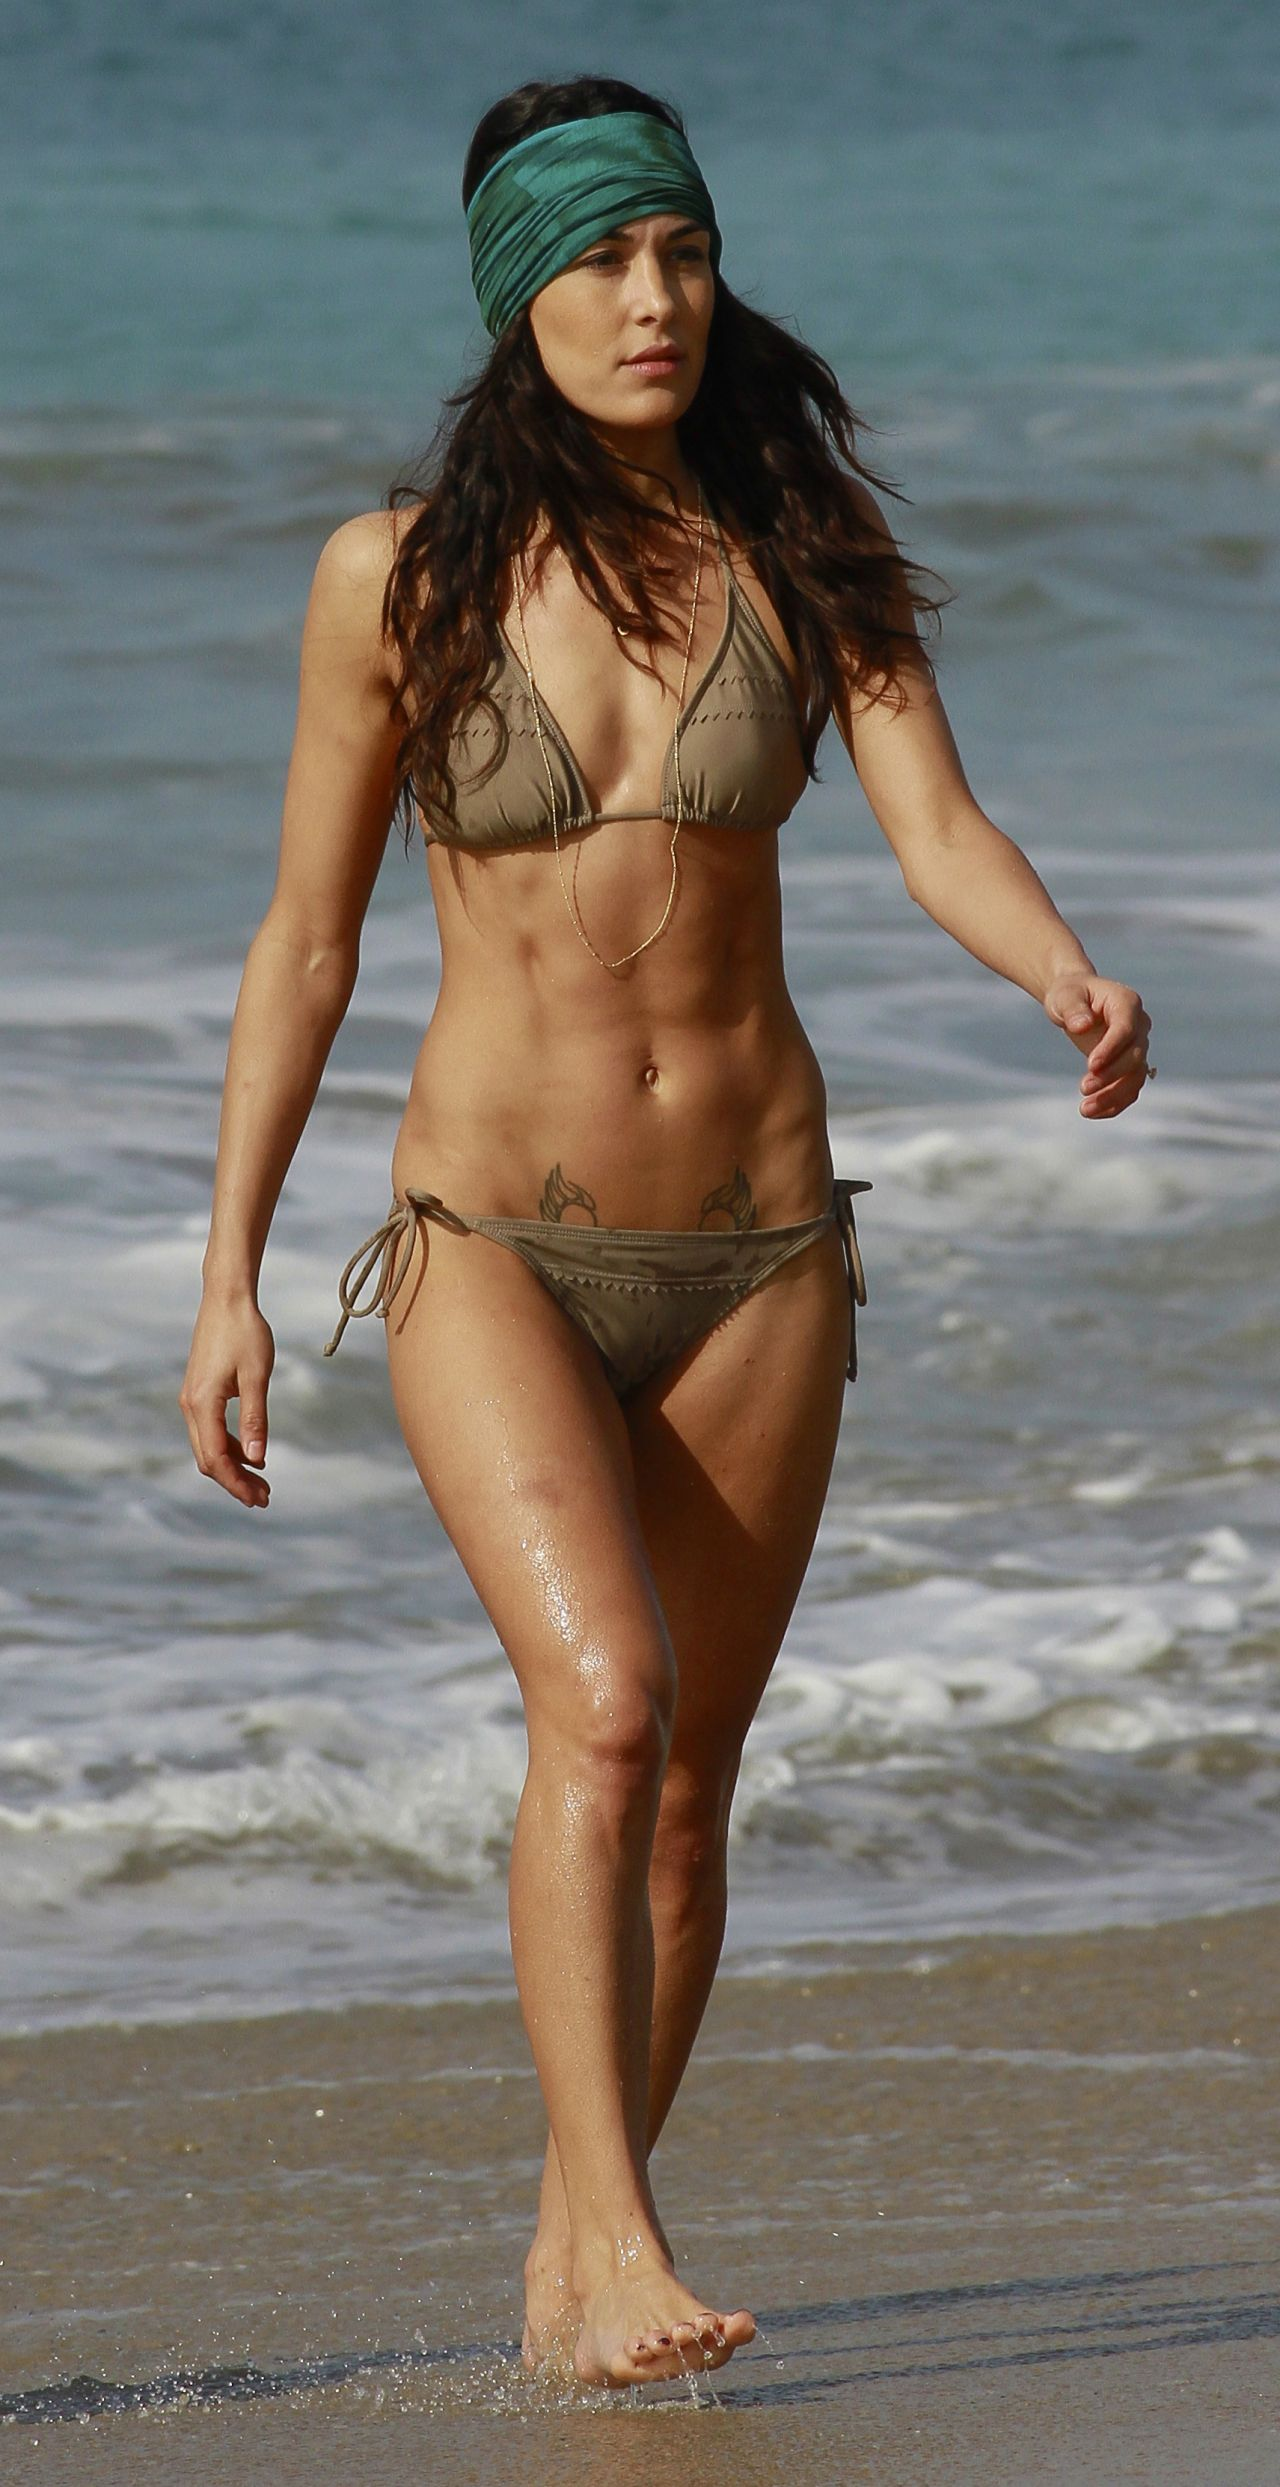 Nikki Rhodes and Felony strip off their bikini to show pussy  136013